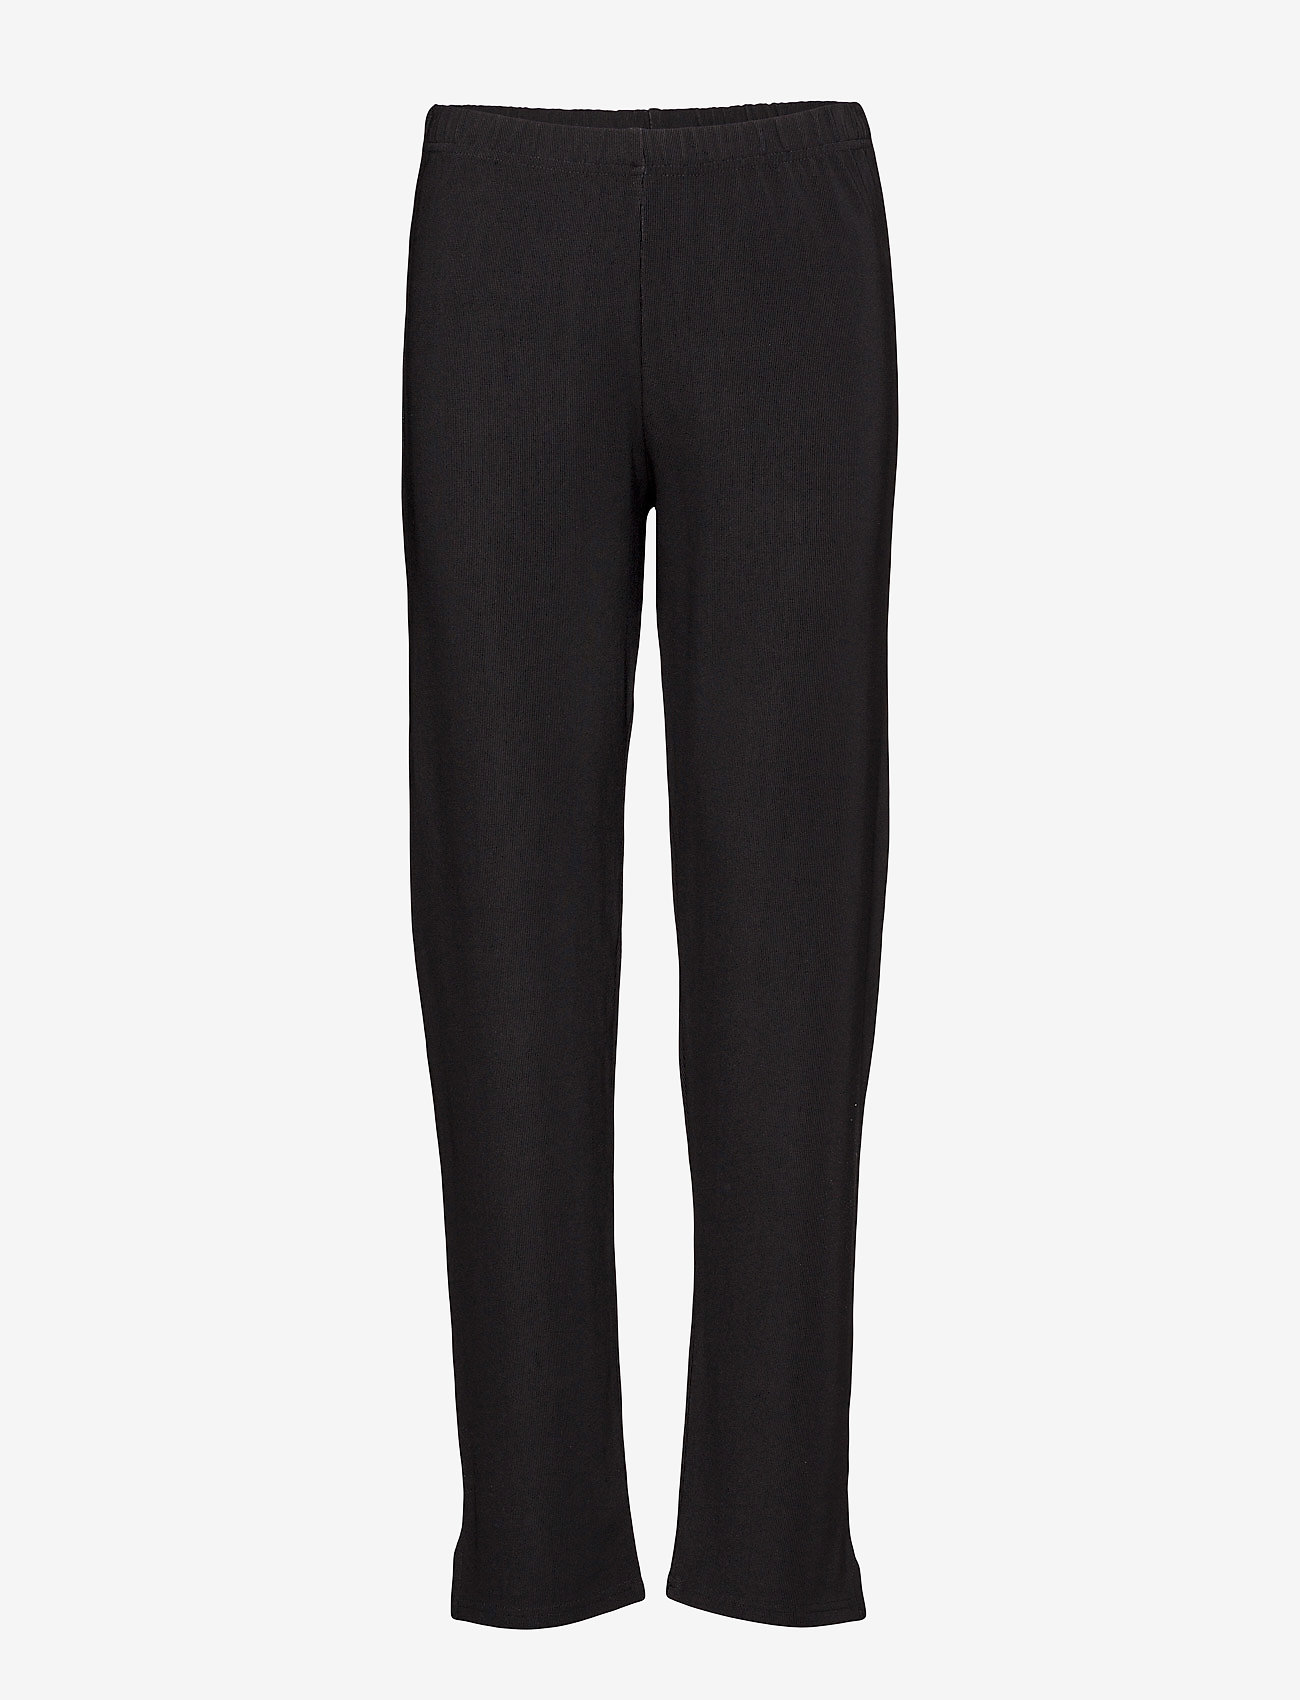 Masai - Priam - bukser med brede ben - black - 0